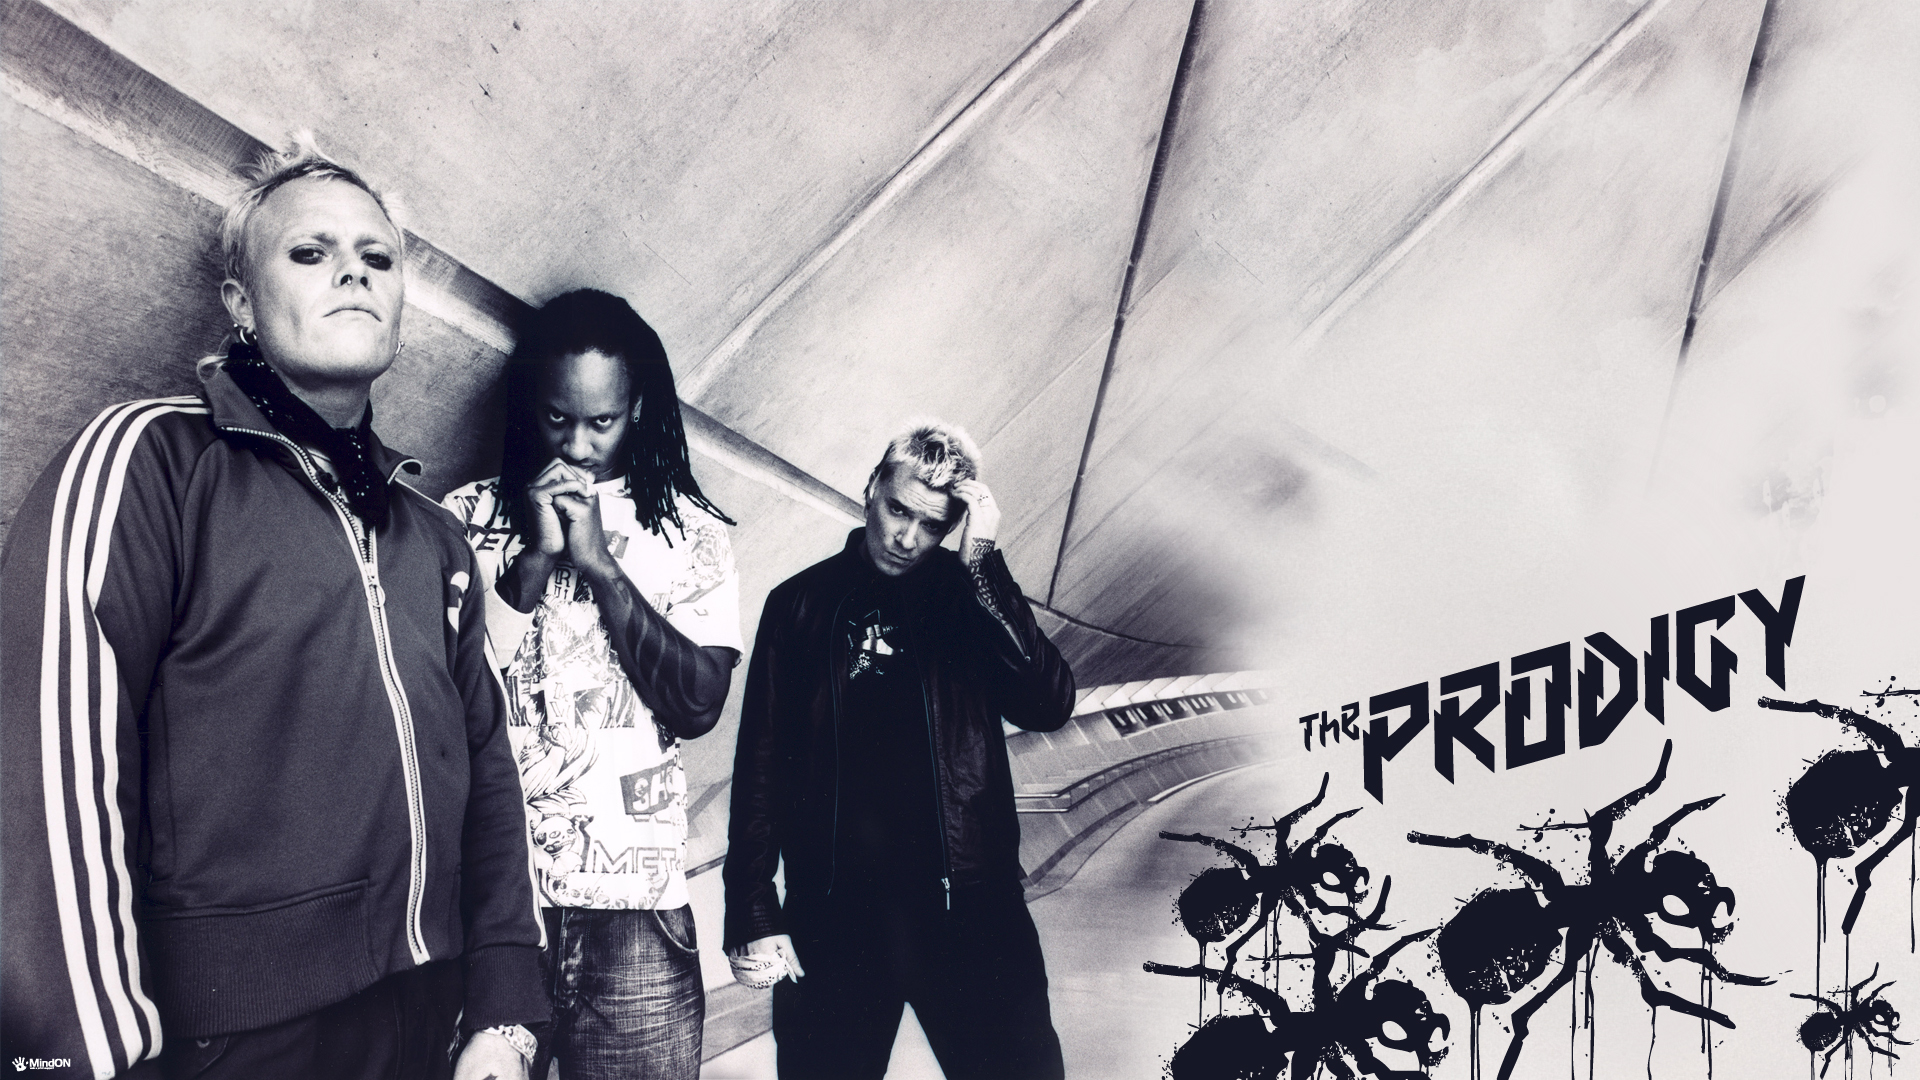 The Prodigy concert binnen 15 minuten uitverkocht